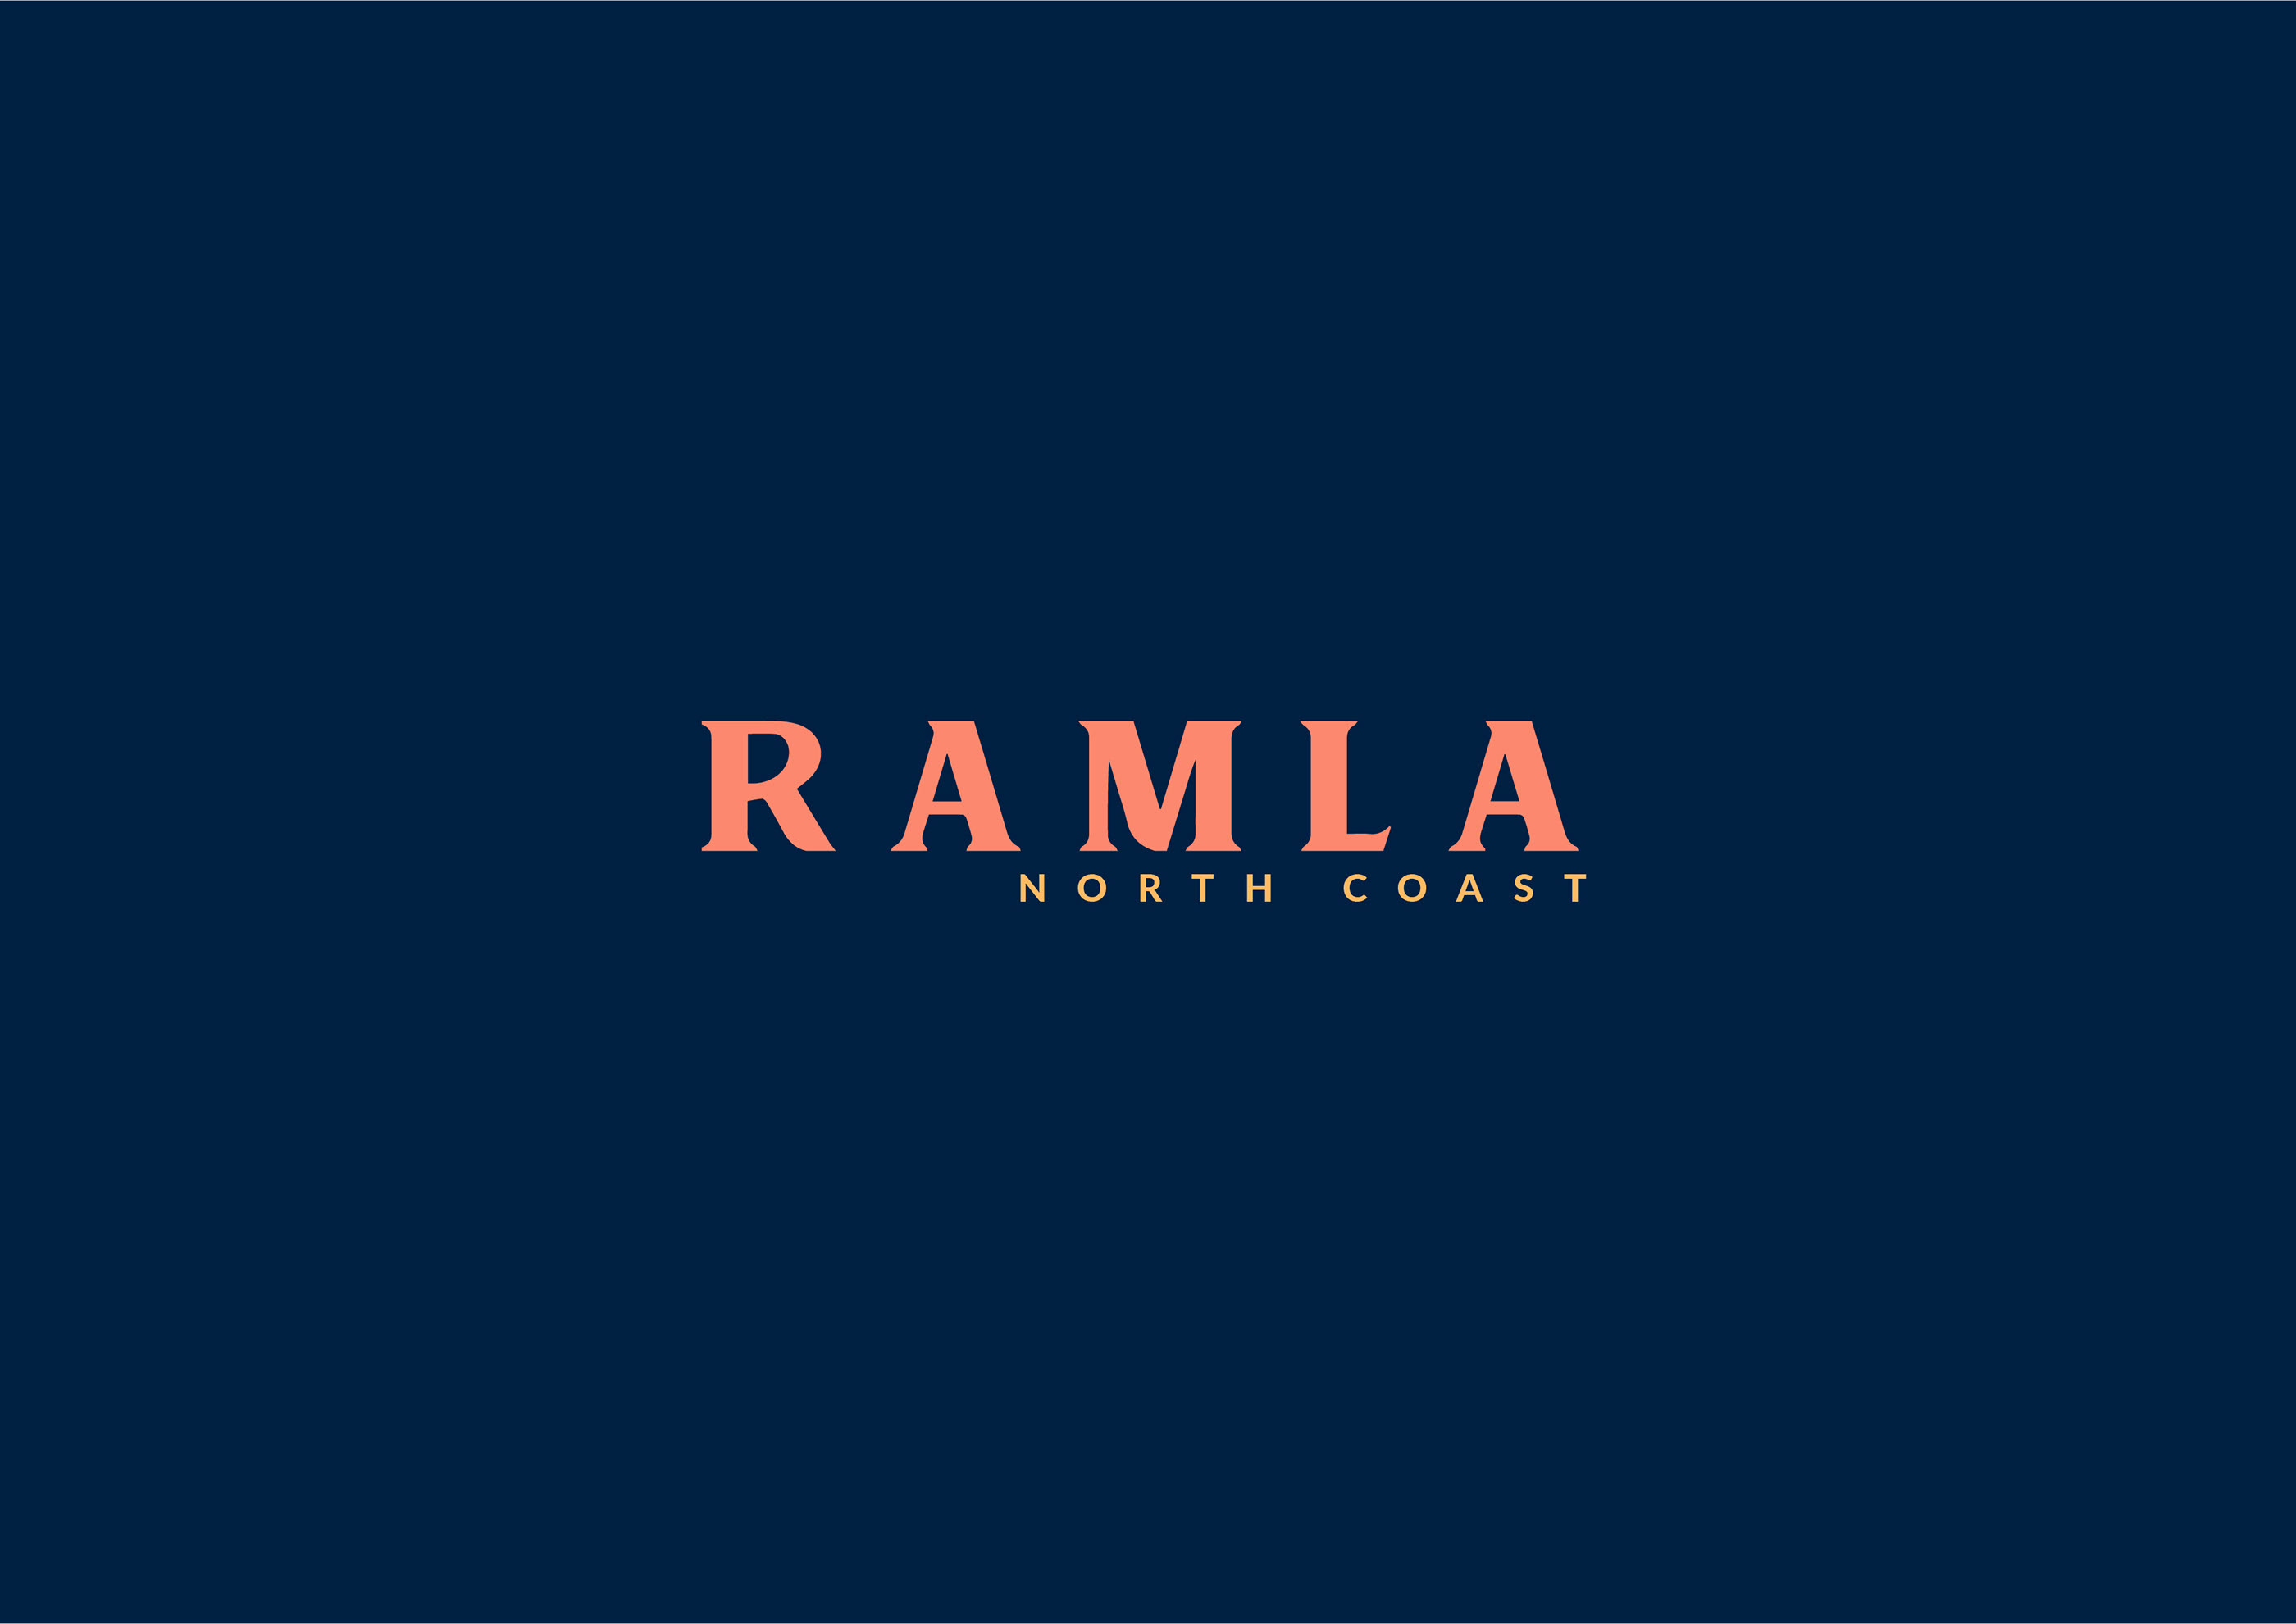 Girls in Ramla